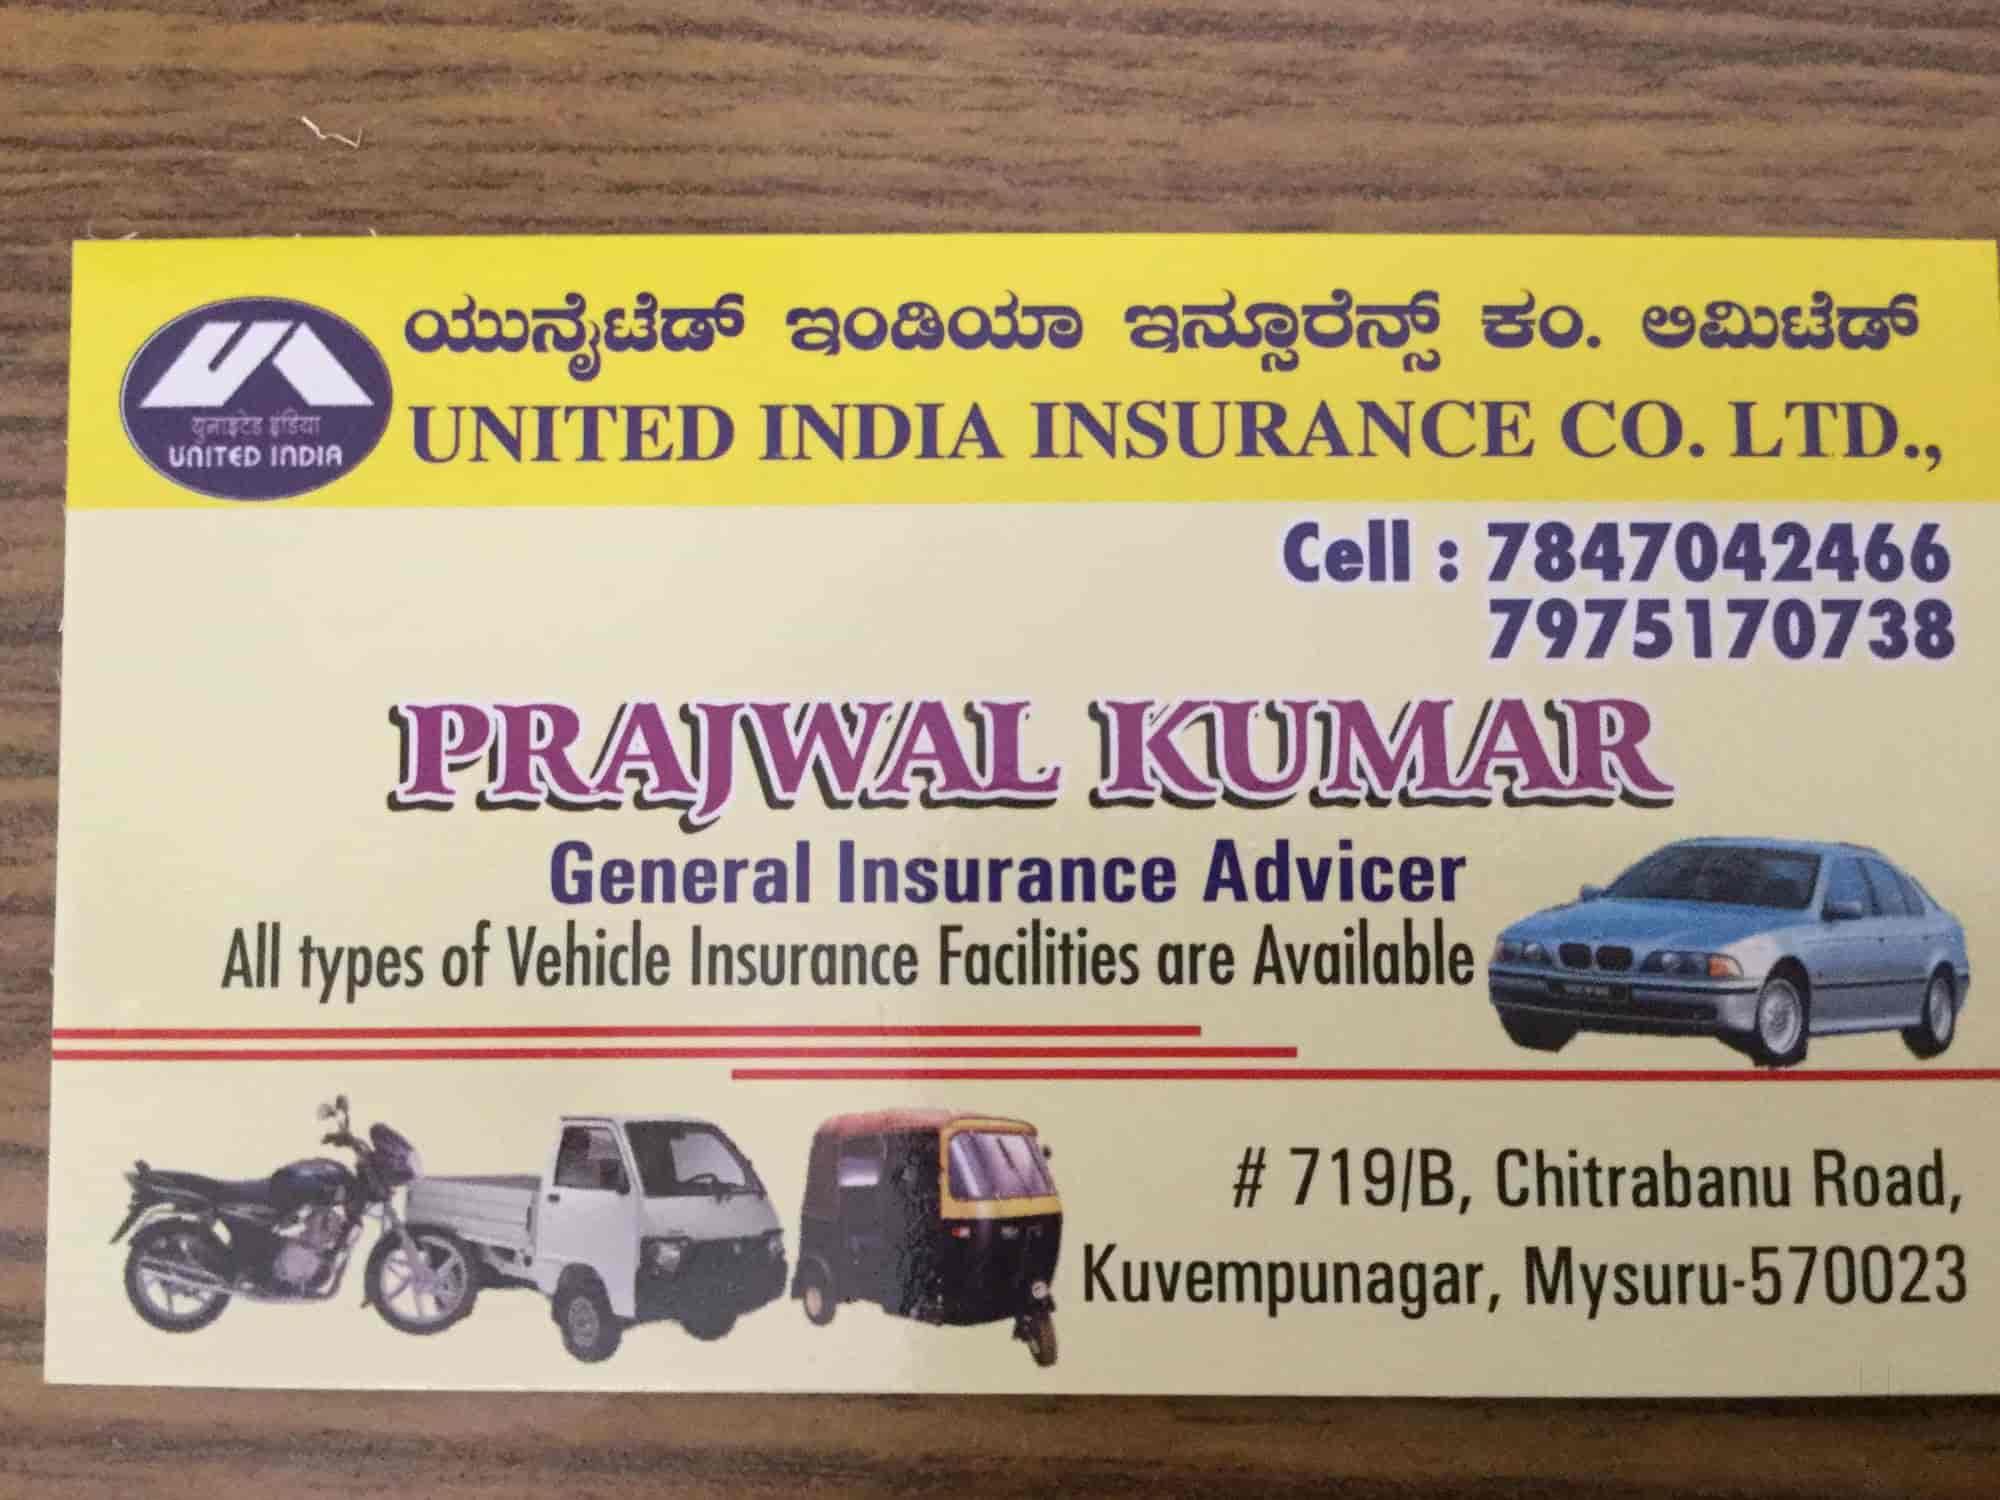 United vehicle insurance vehicle ideas for Unite motor co ltd